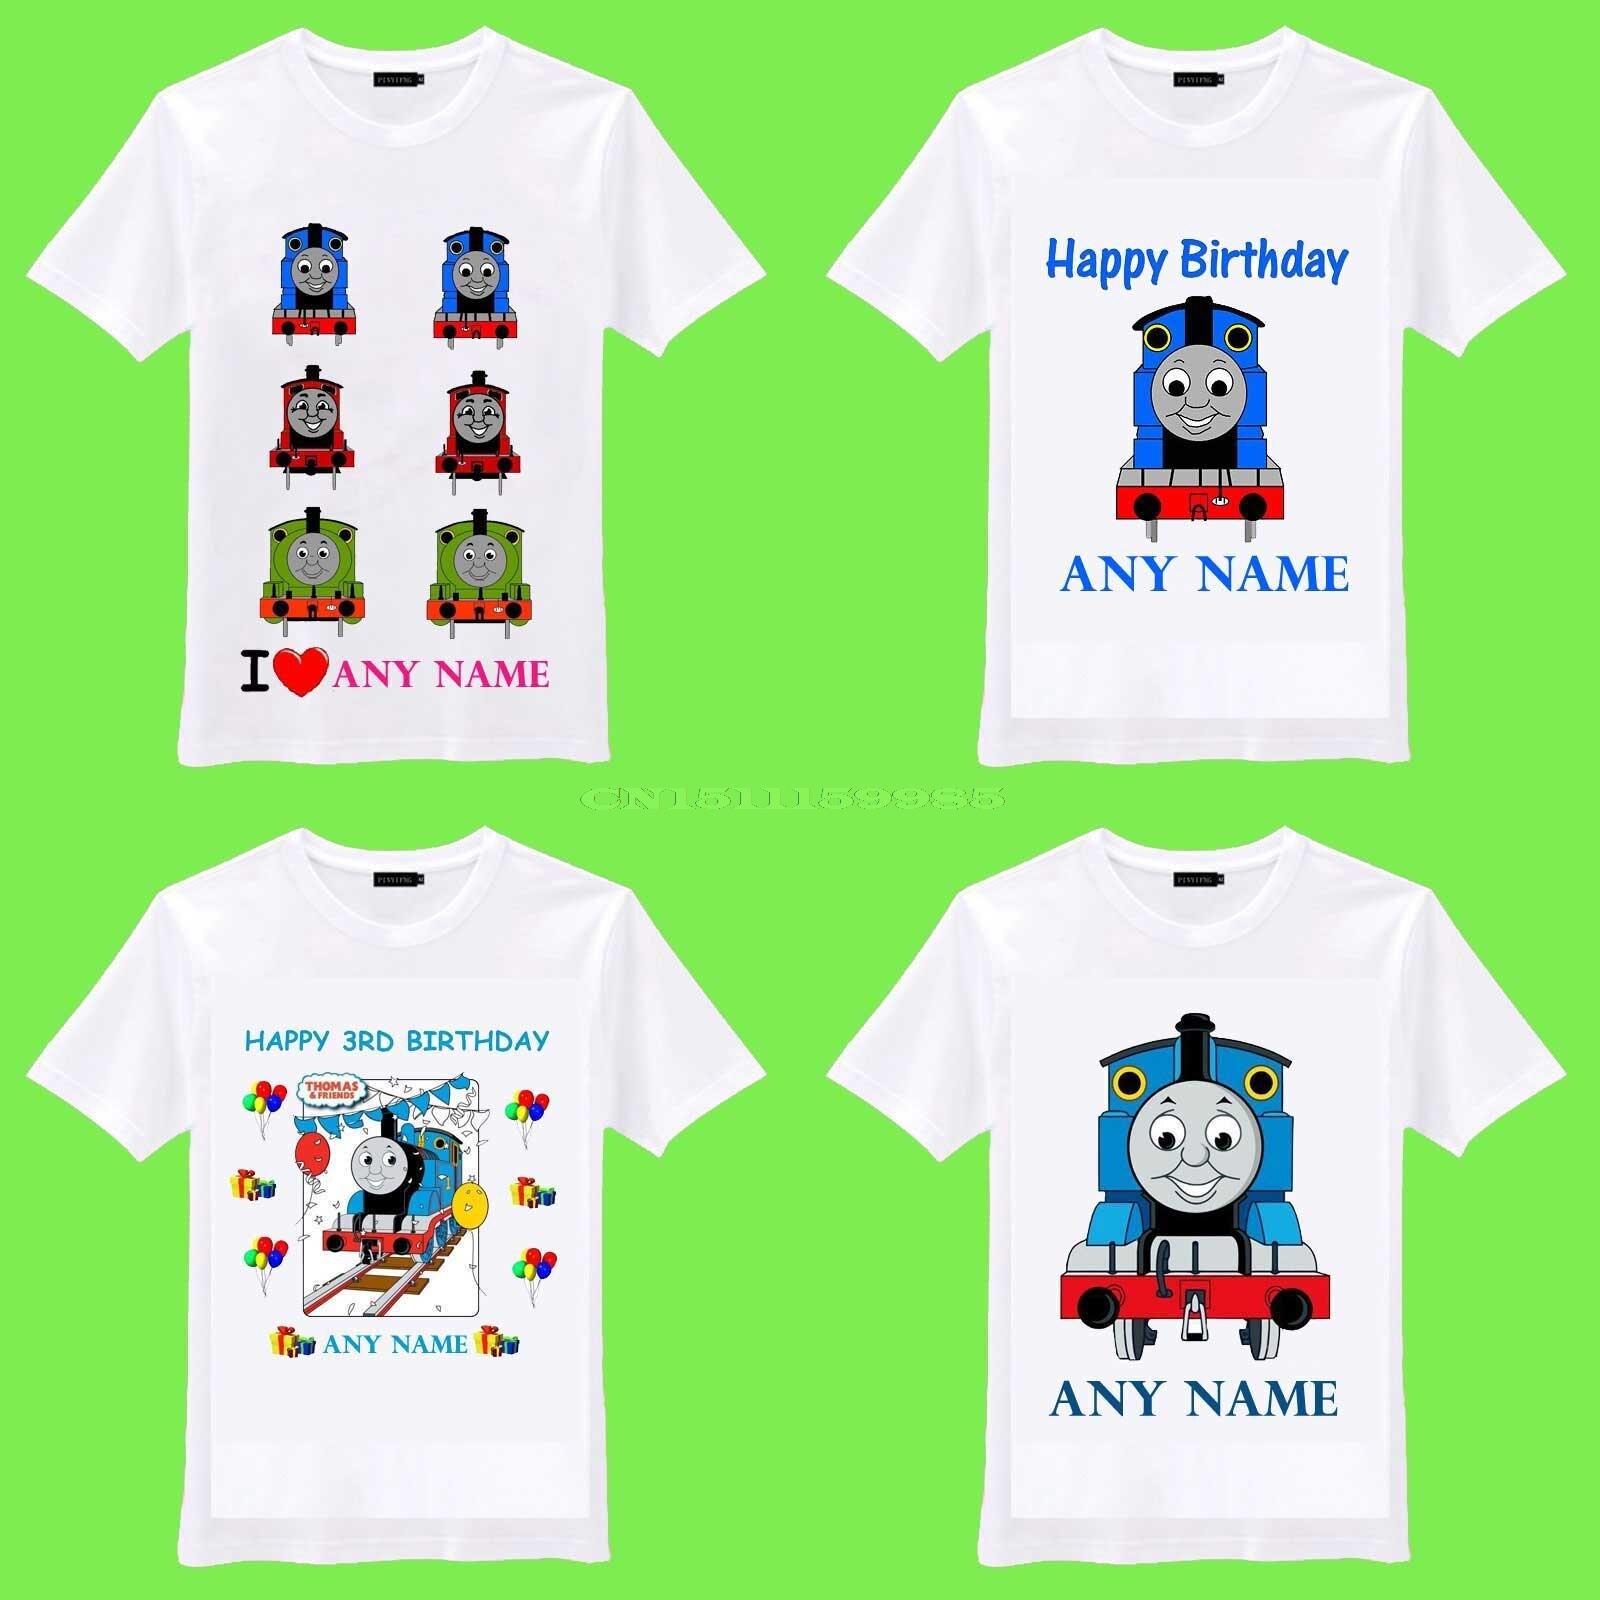 Childrens Birthday T Shirts